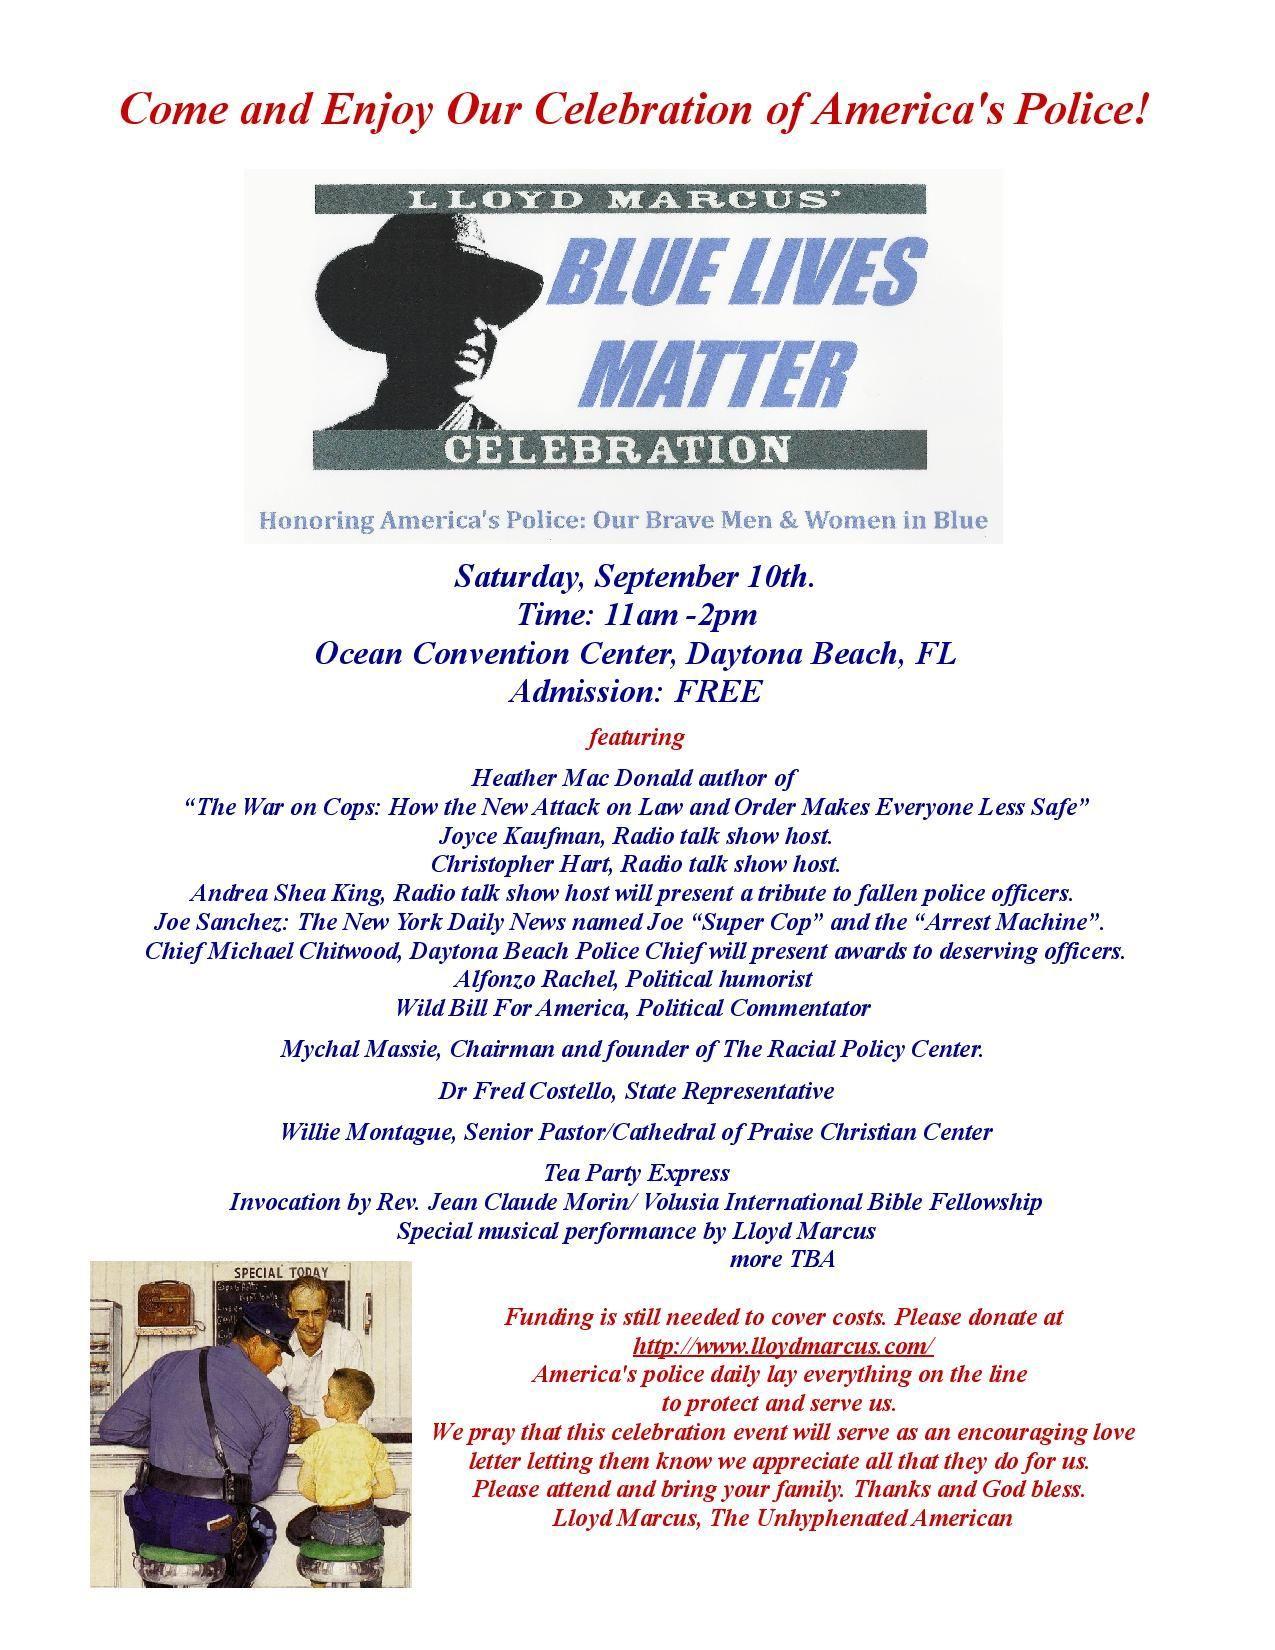 BLUE LIVES MATTER FLYER jpg